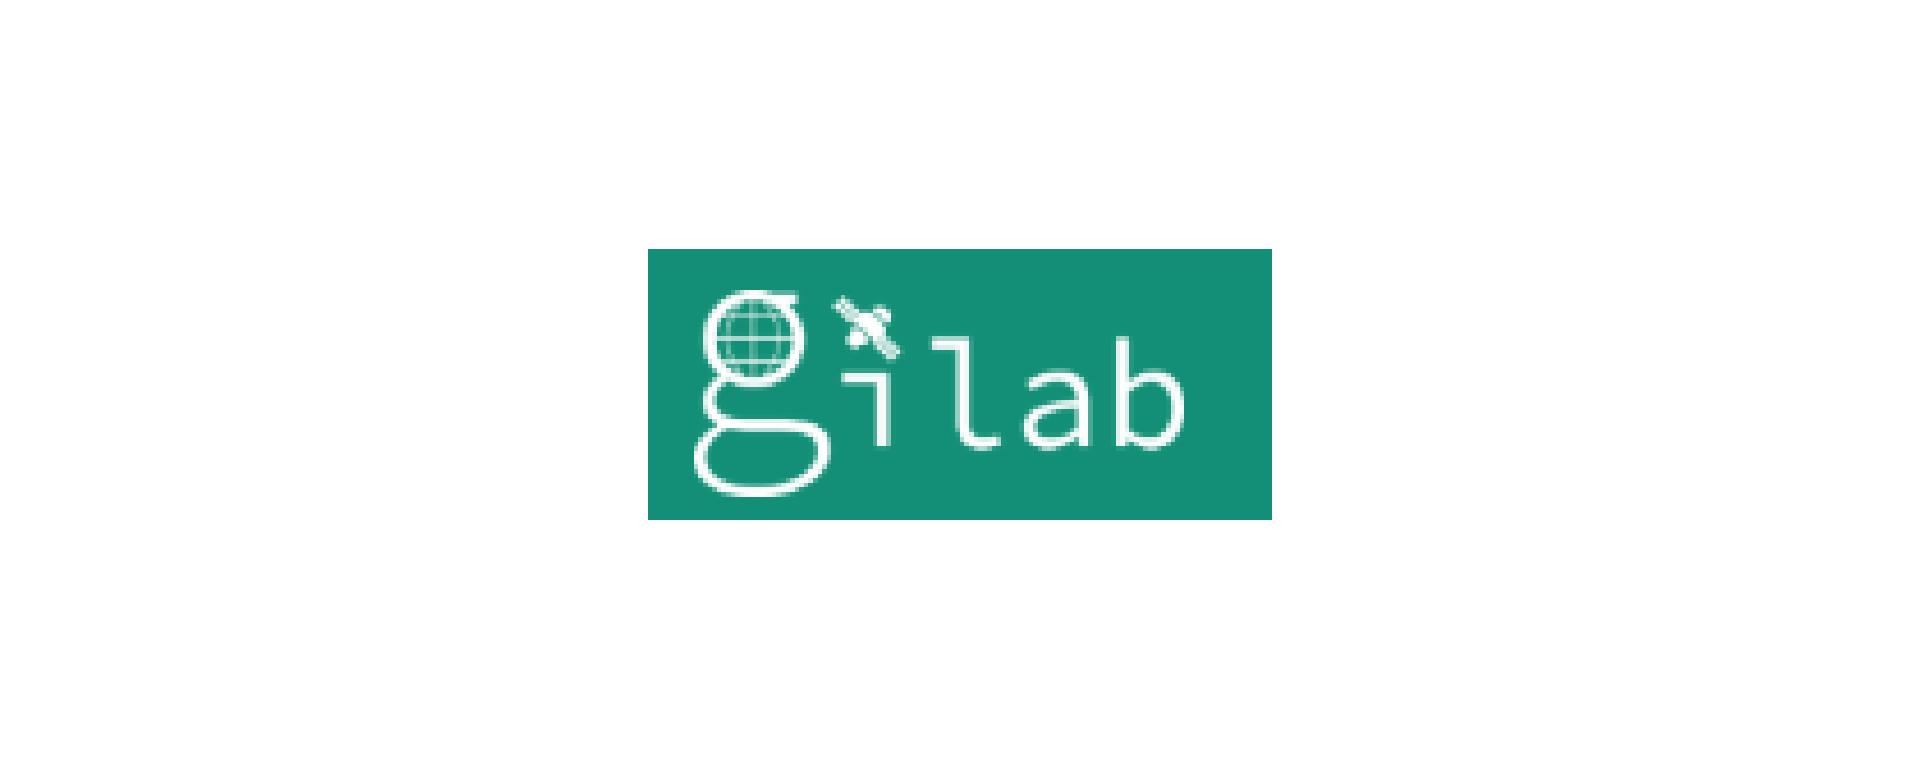 GILAB partner